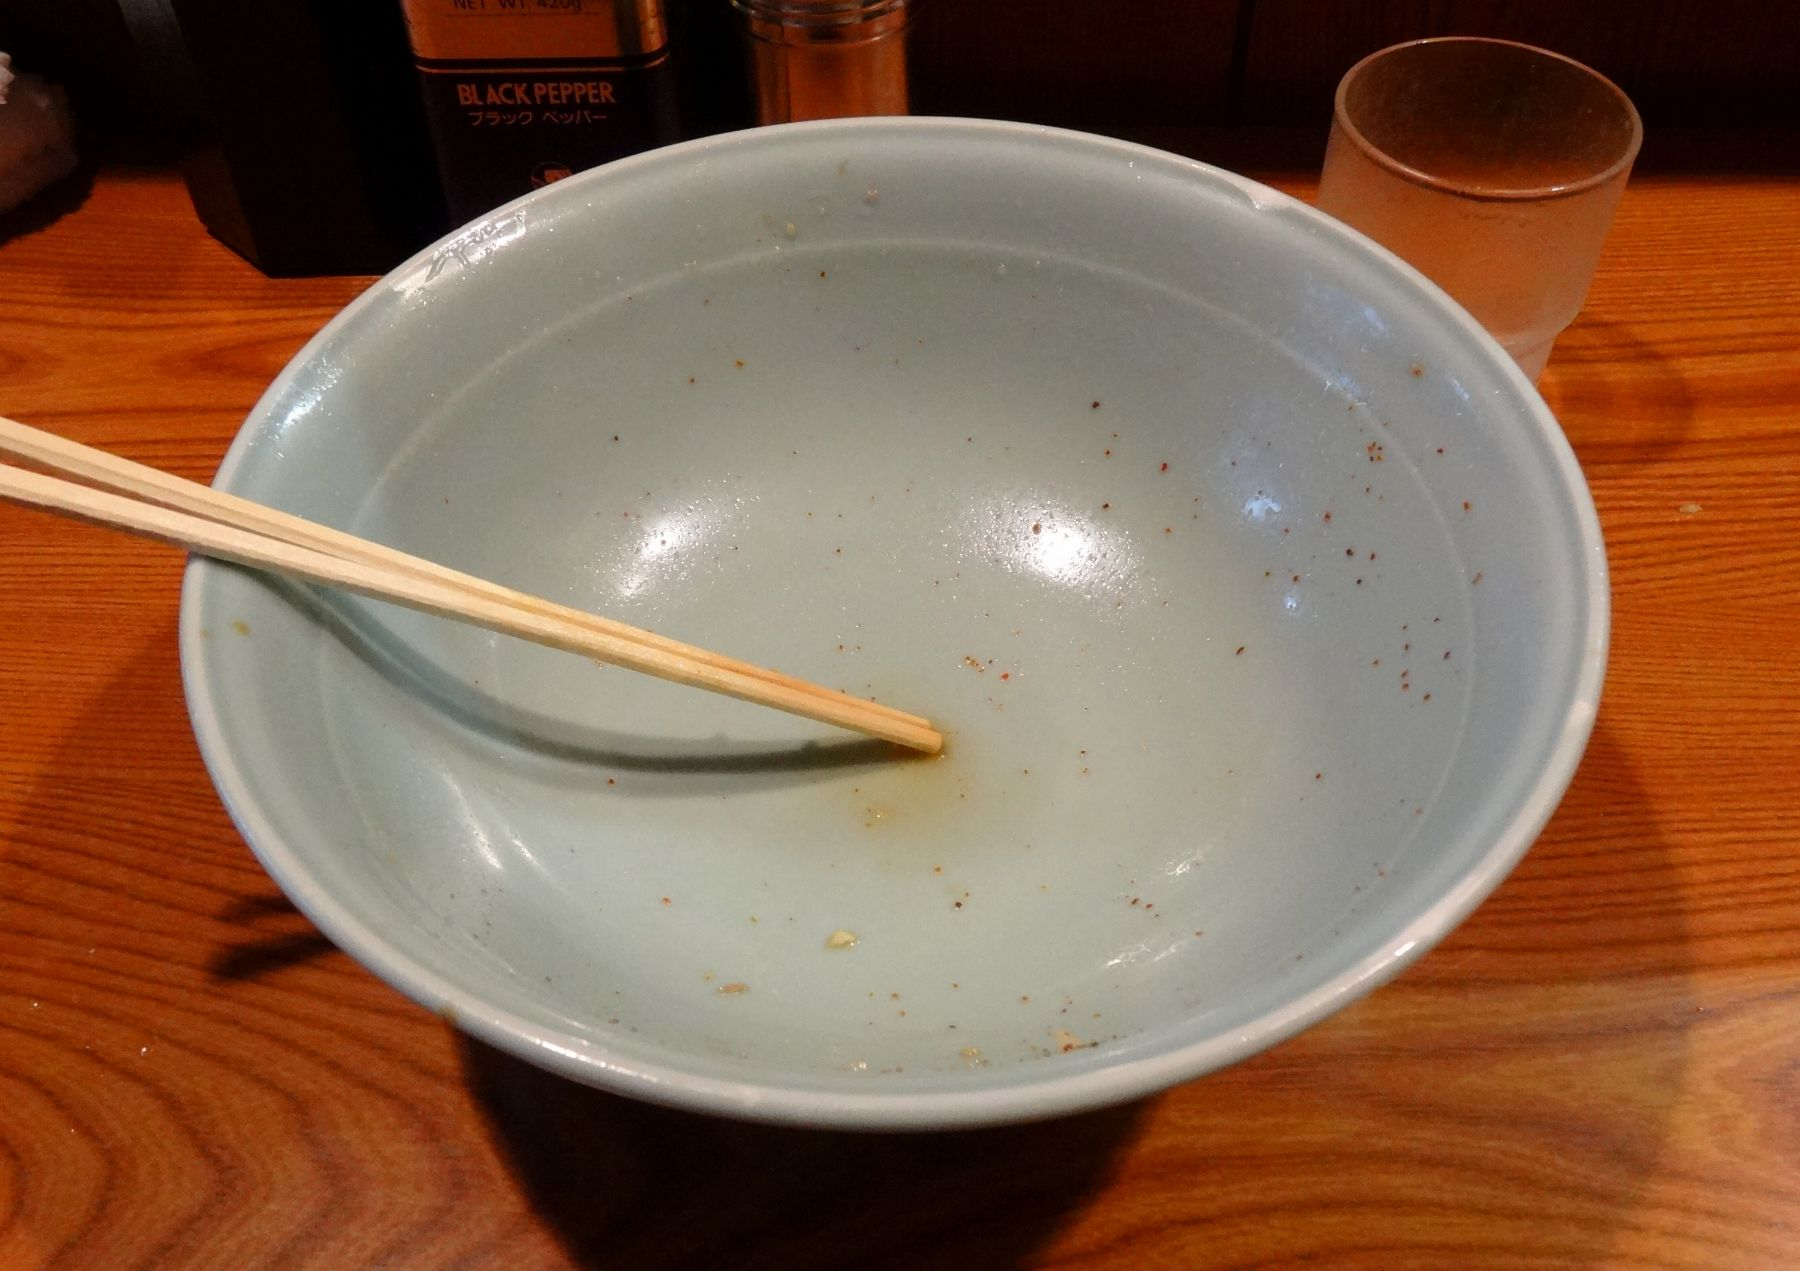 20121117006kameido.jpg